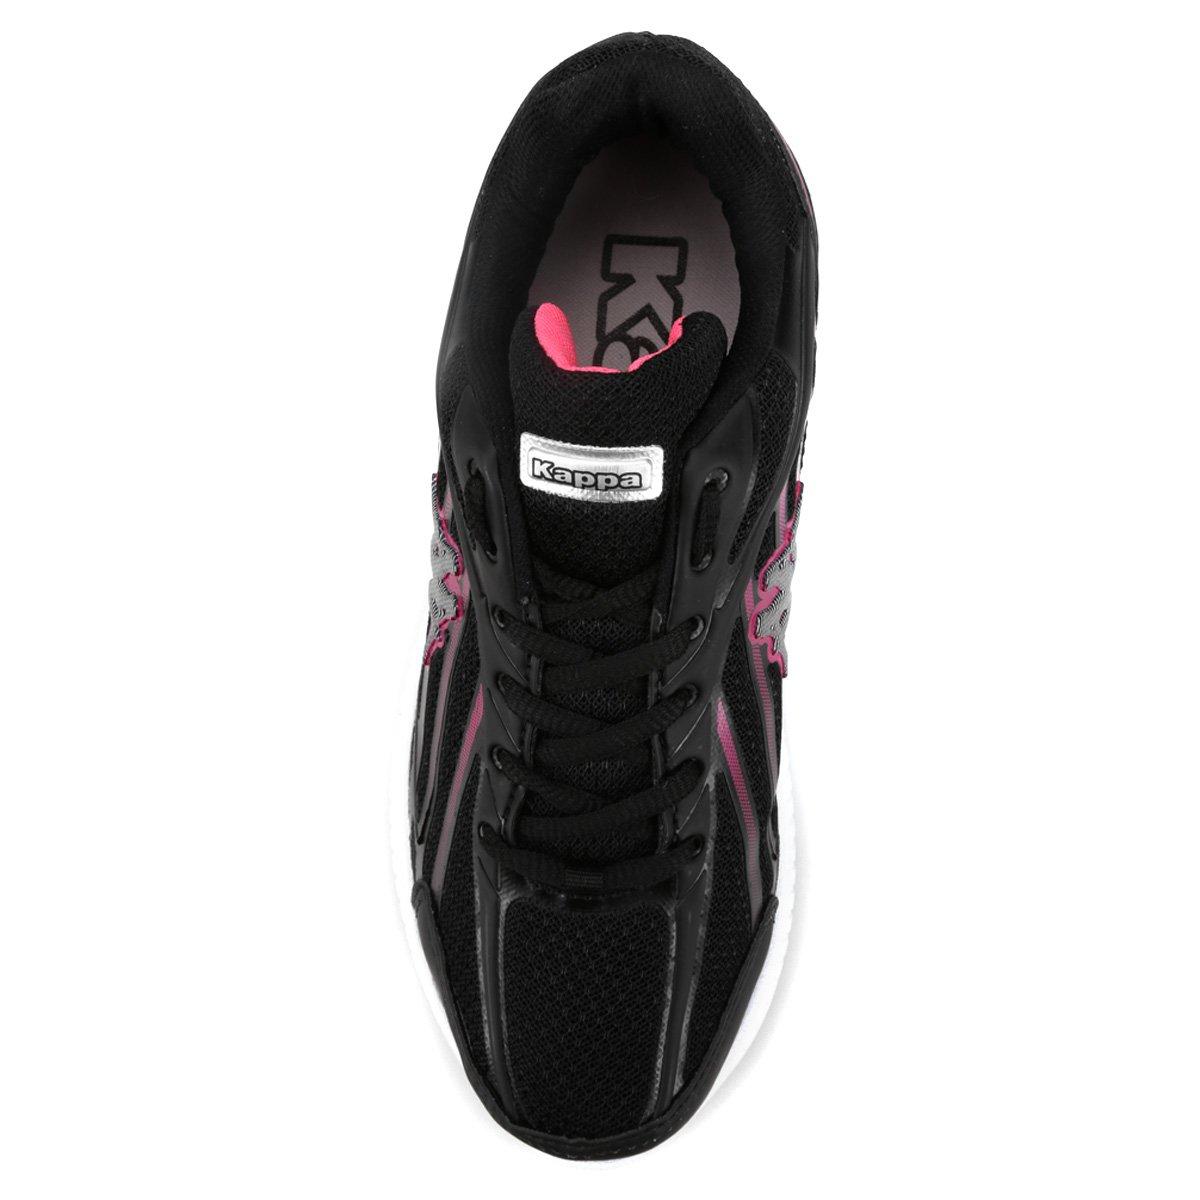 Tênis Preto e Tênis Kappa Pink Kappa Feminino Sicília 1Xr1Yq